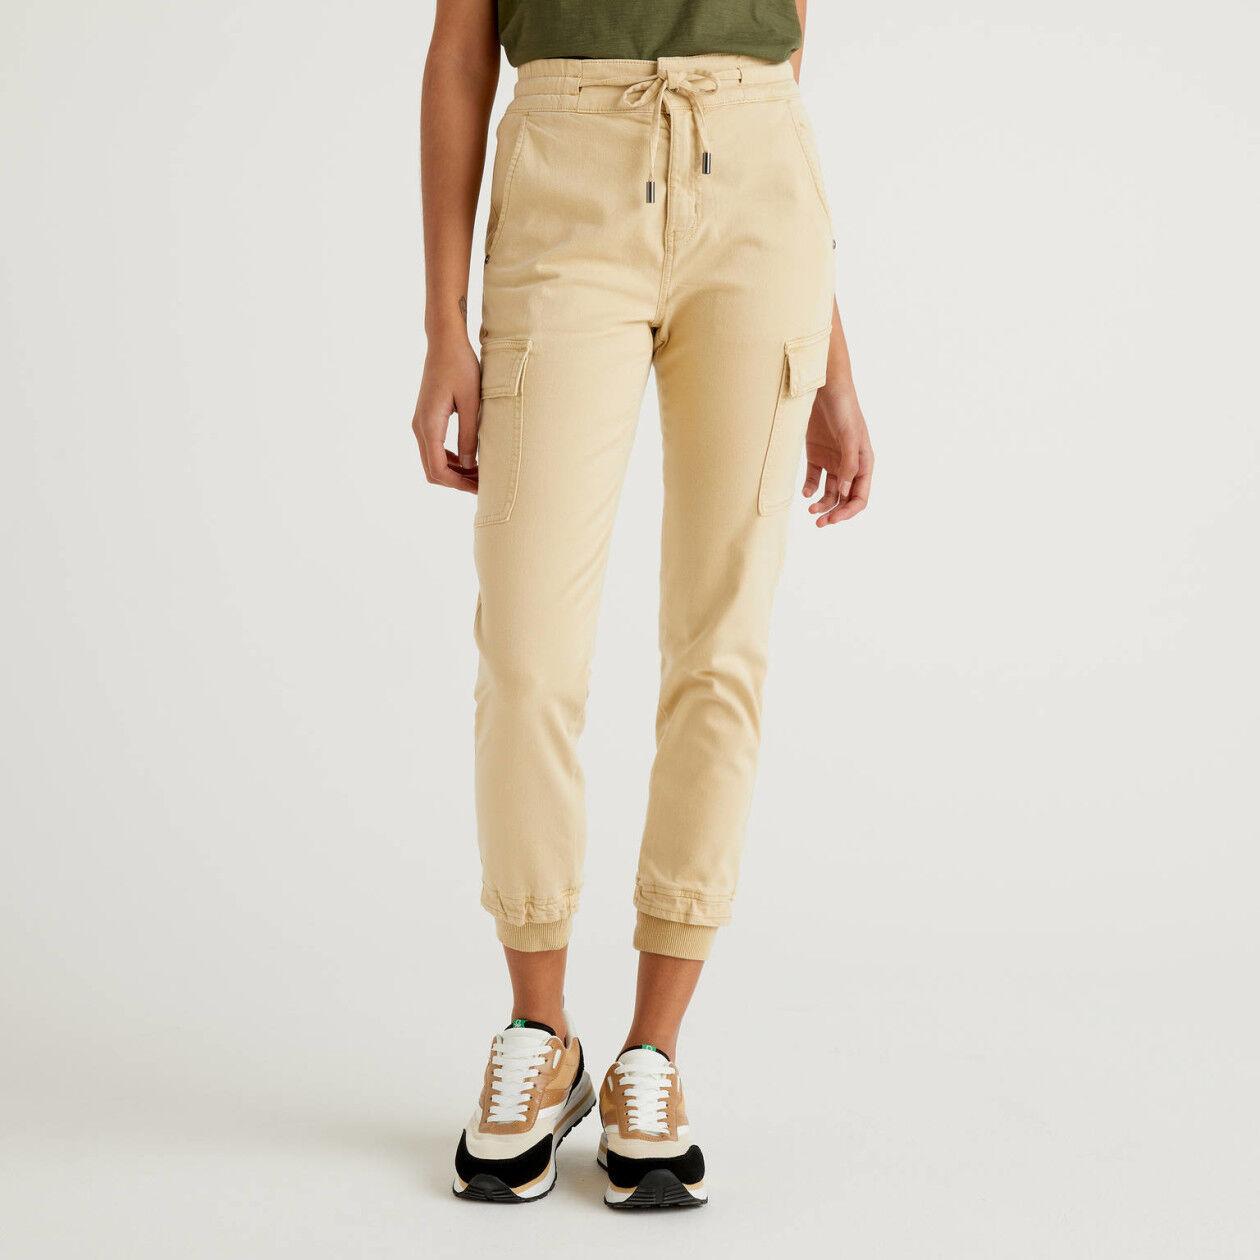 Pantalon cargo coupe slim en coton stretch